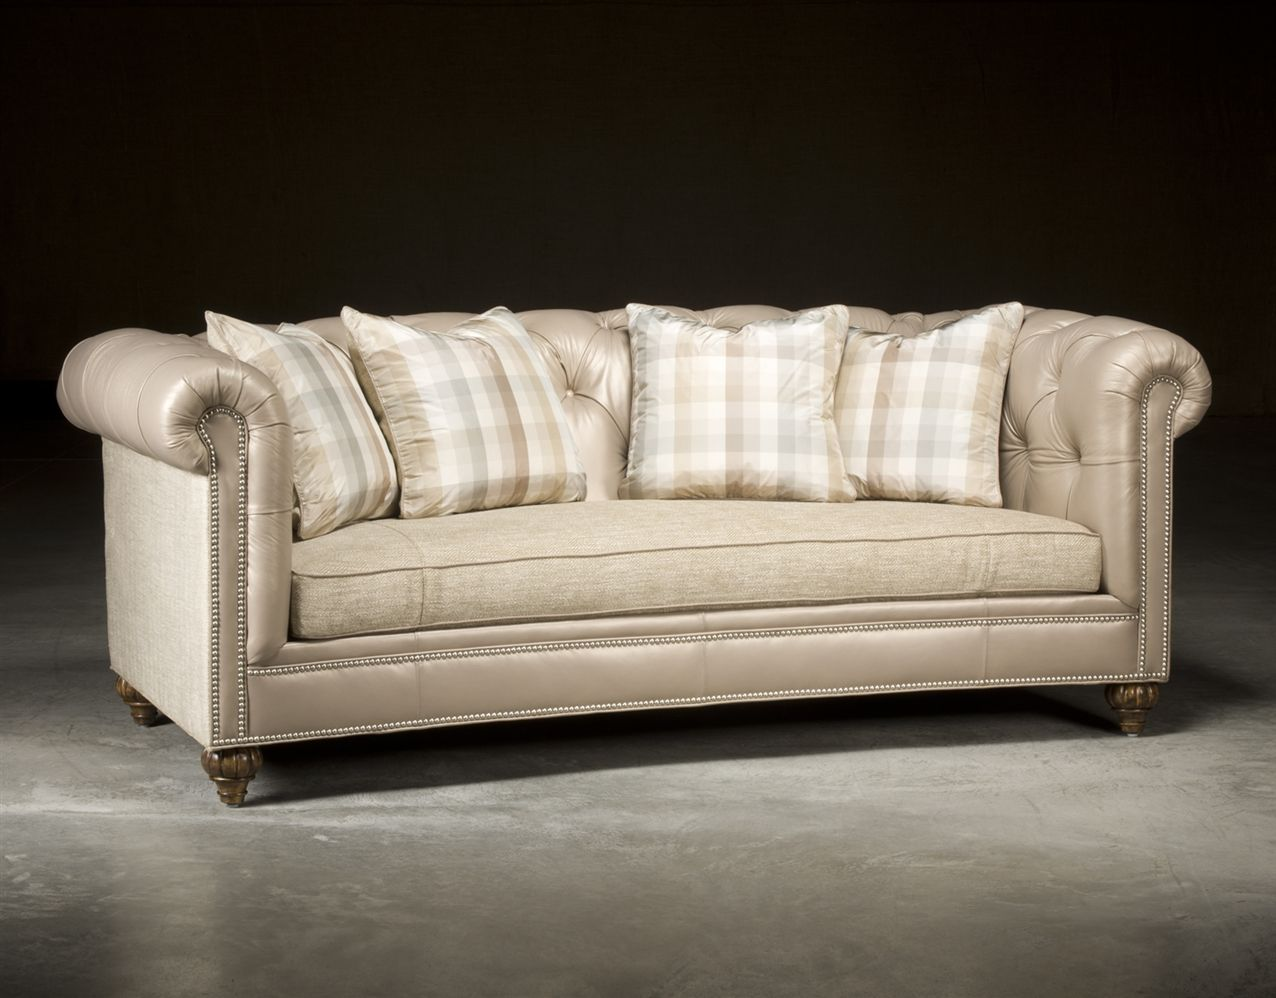 High End Leather Sofas Dispose Old Sofa Singapore Designer 72 Qty Description